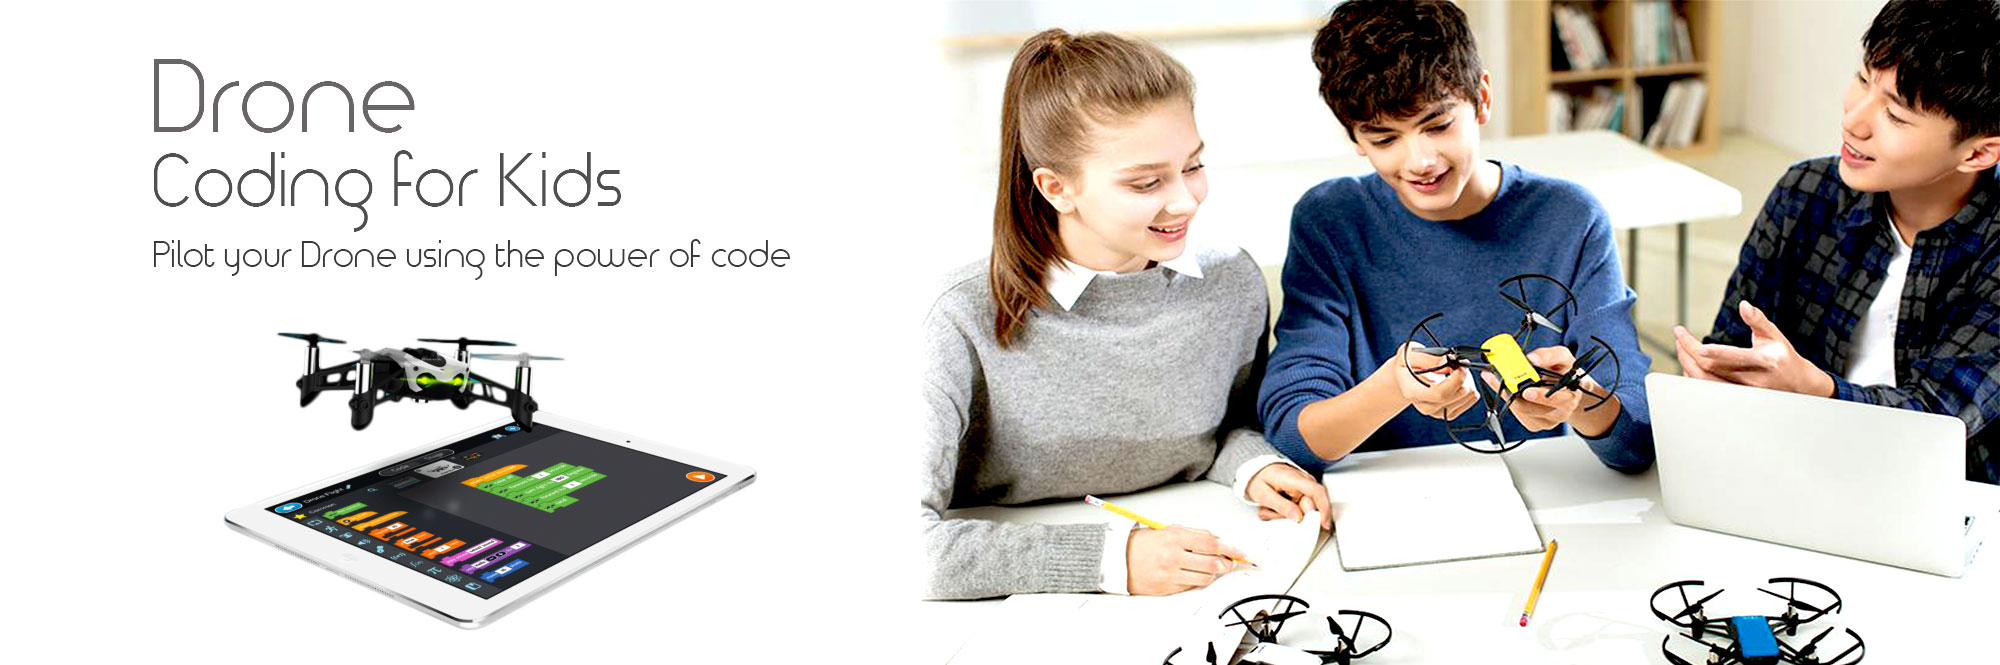 Drone-Coding-for-kids-2.jpg